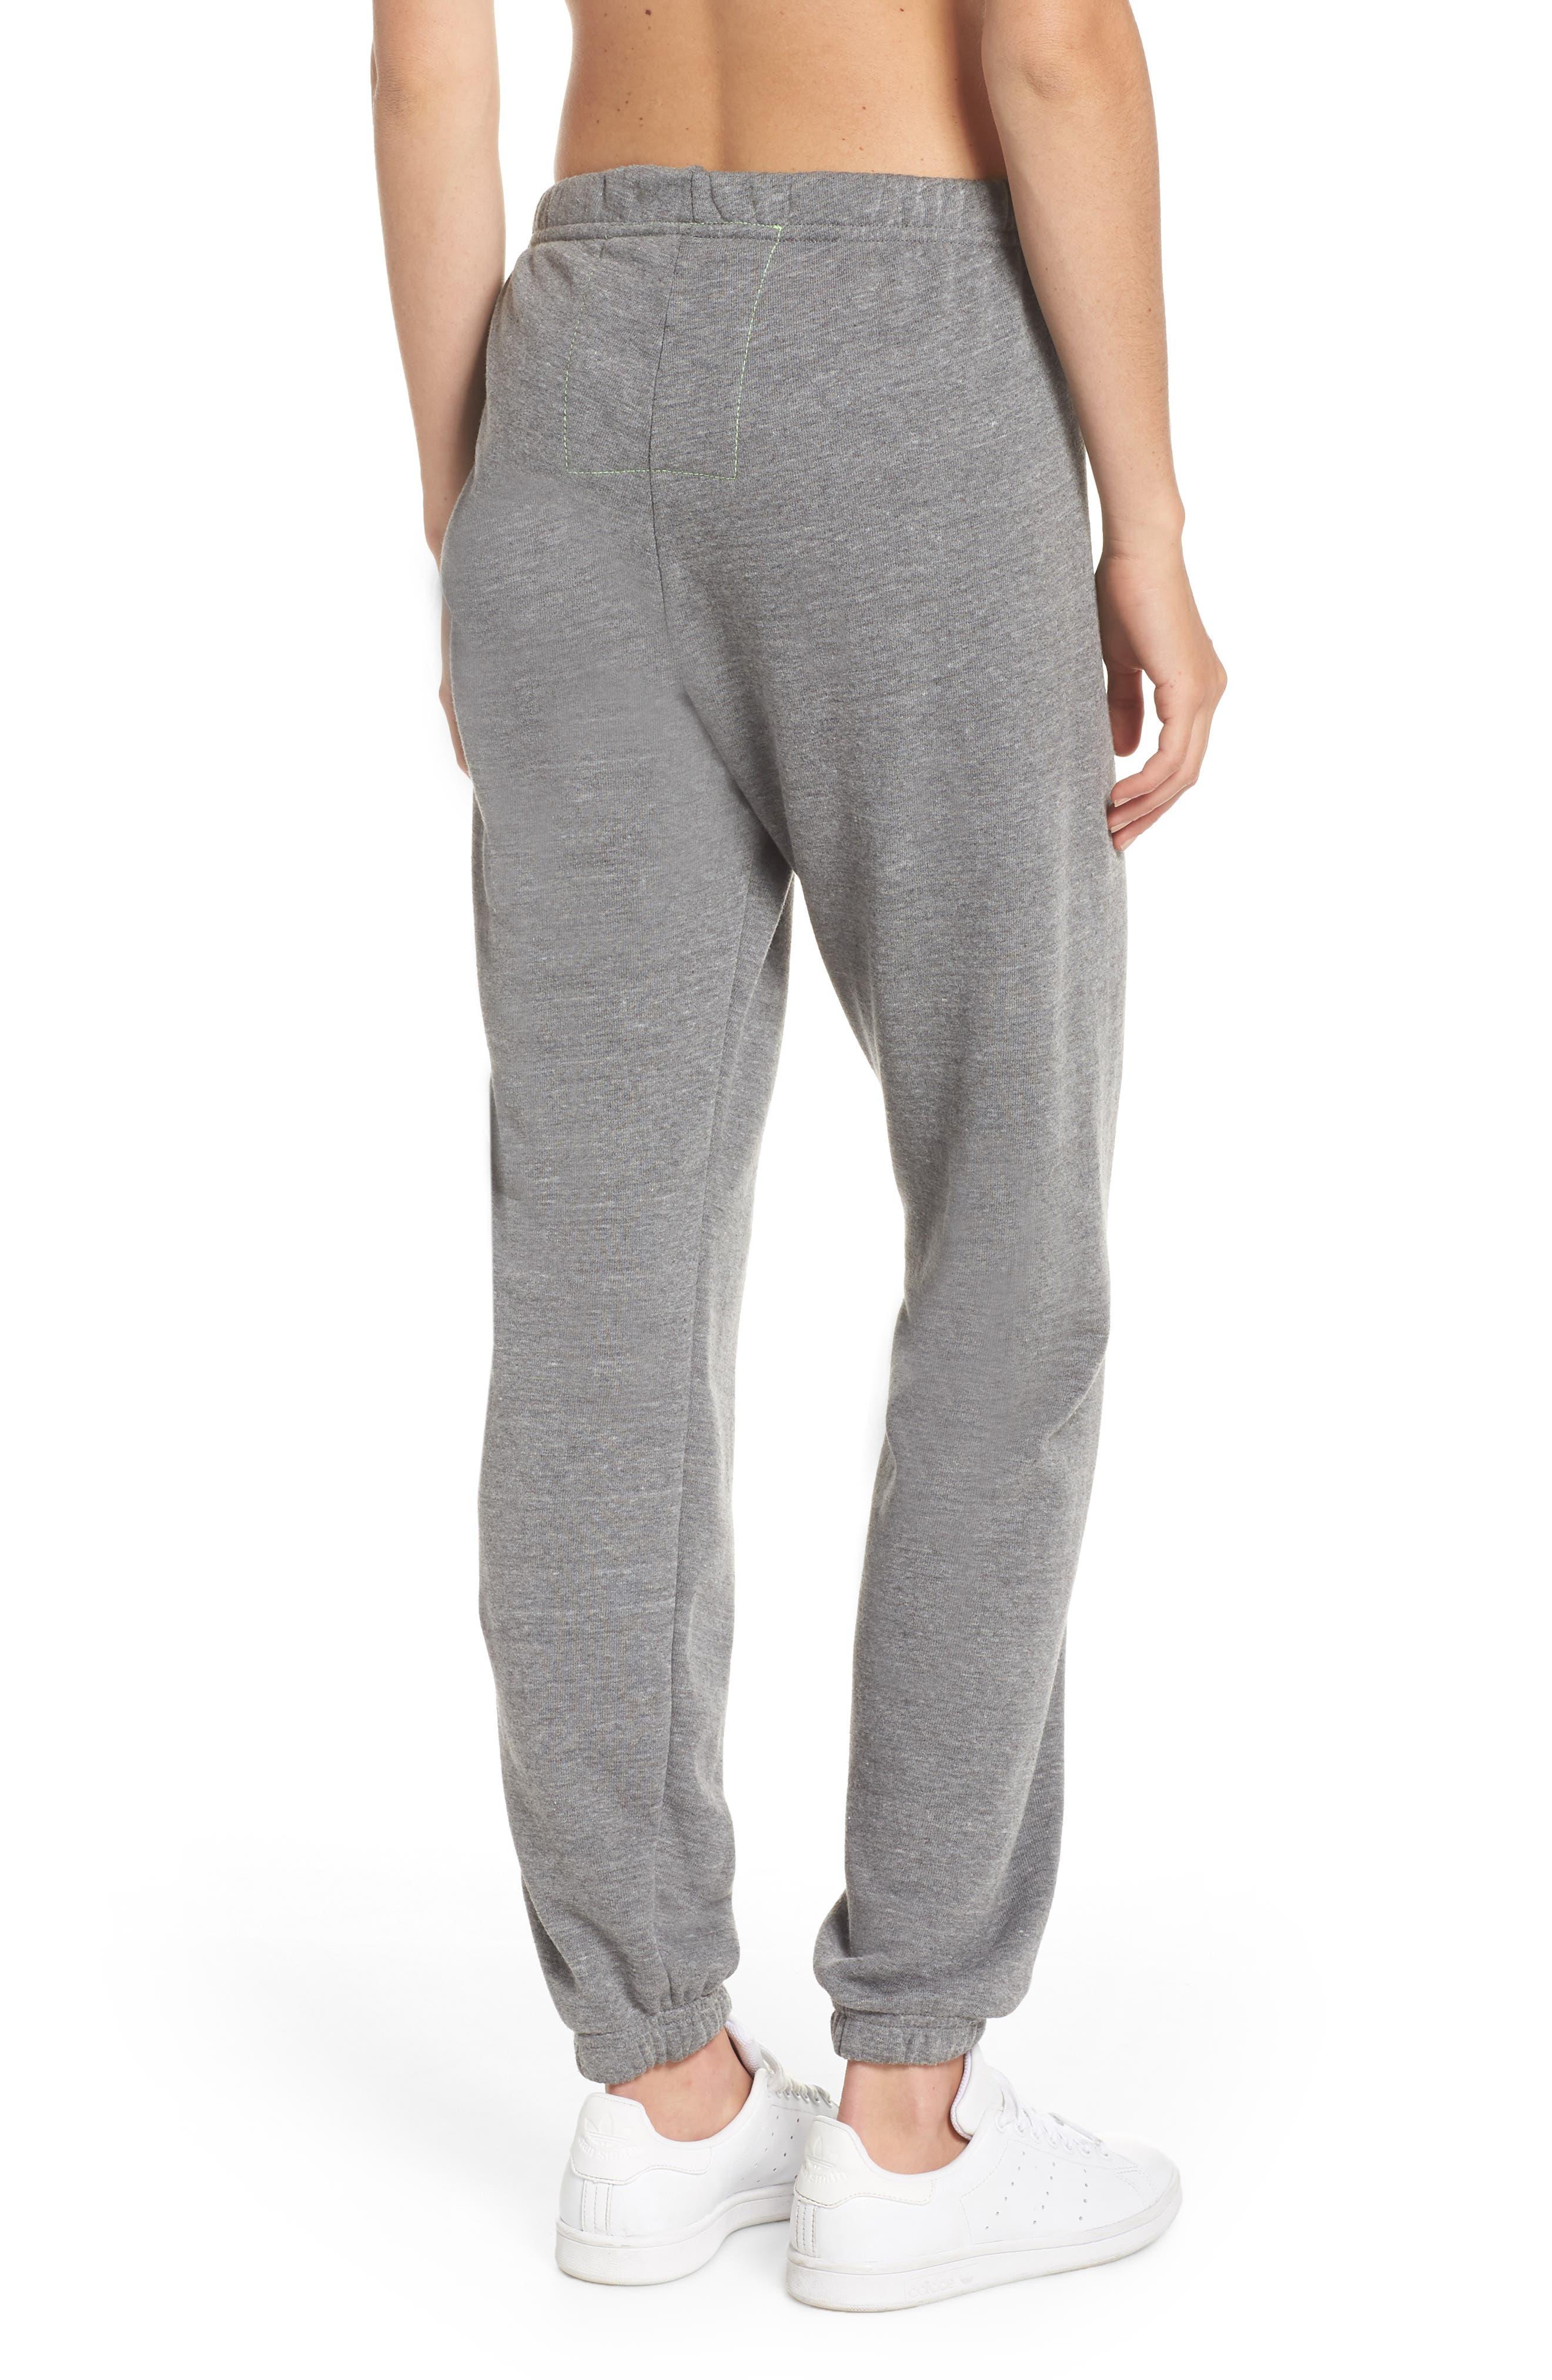 Stripe Sweatpants,                             Alternate thumbnail 2, color,                             Heather Grey/ Blue Stripes